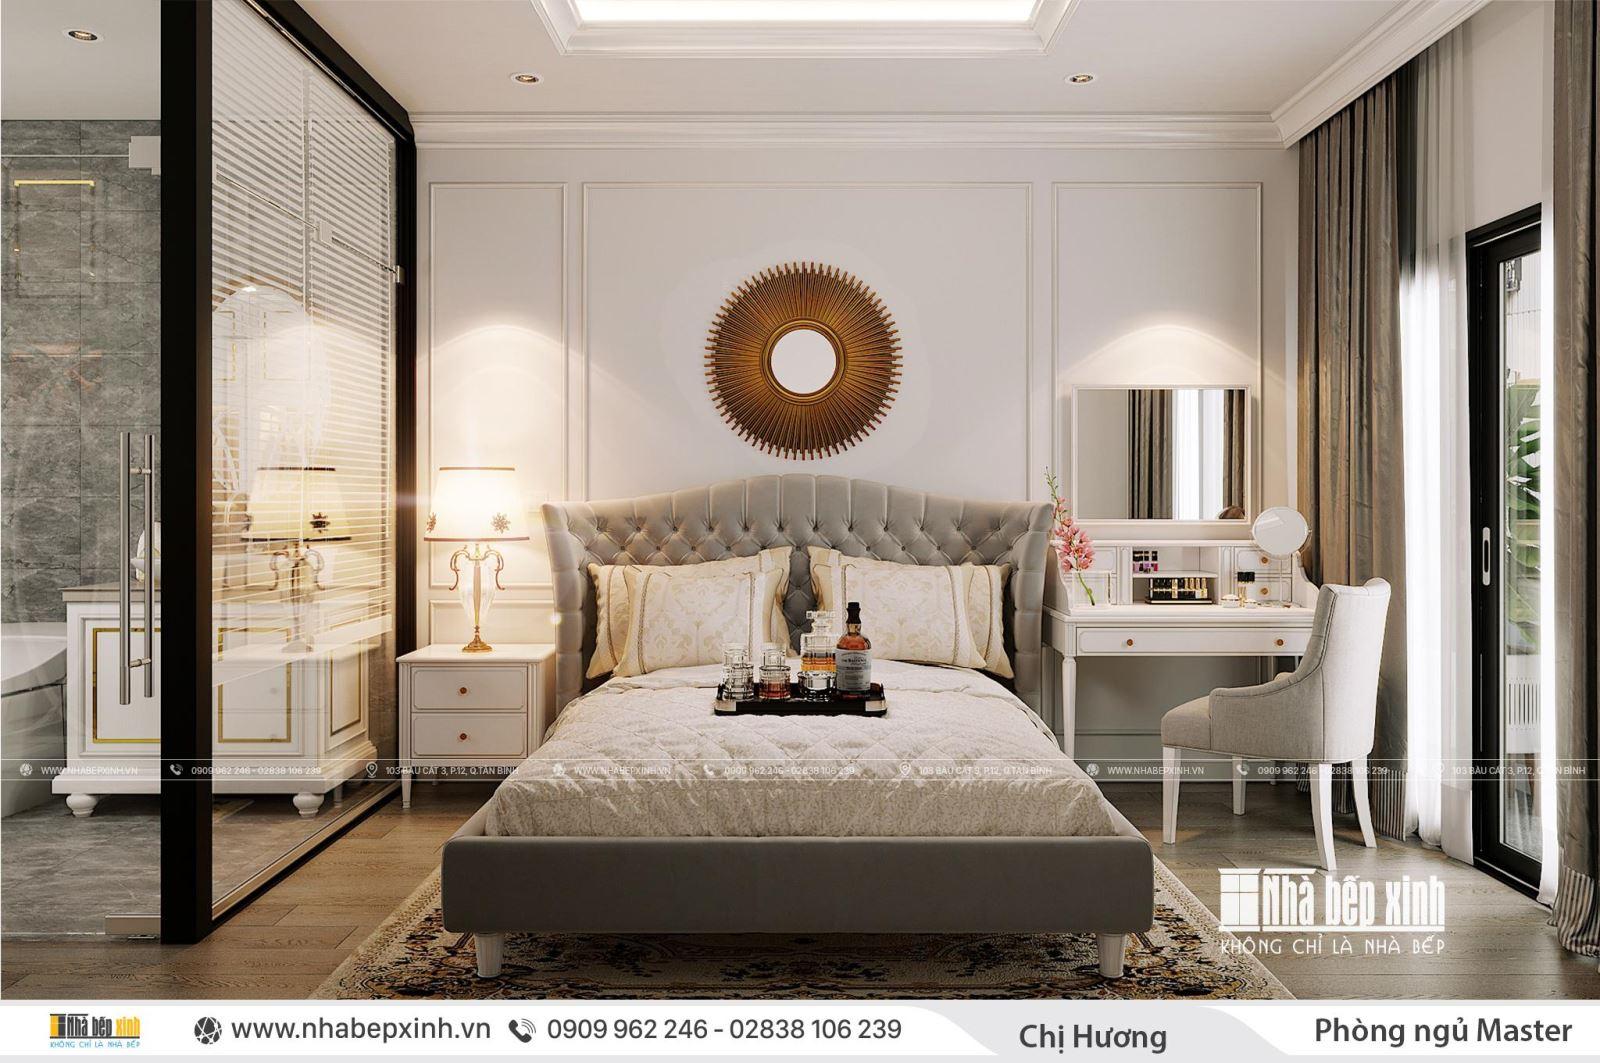 Thiết kế nội thất căn hộ Shophouse Emerald Celadon City 160m2